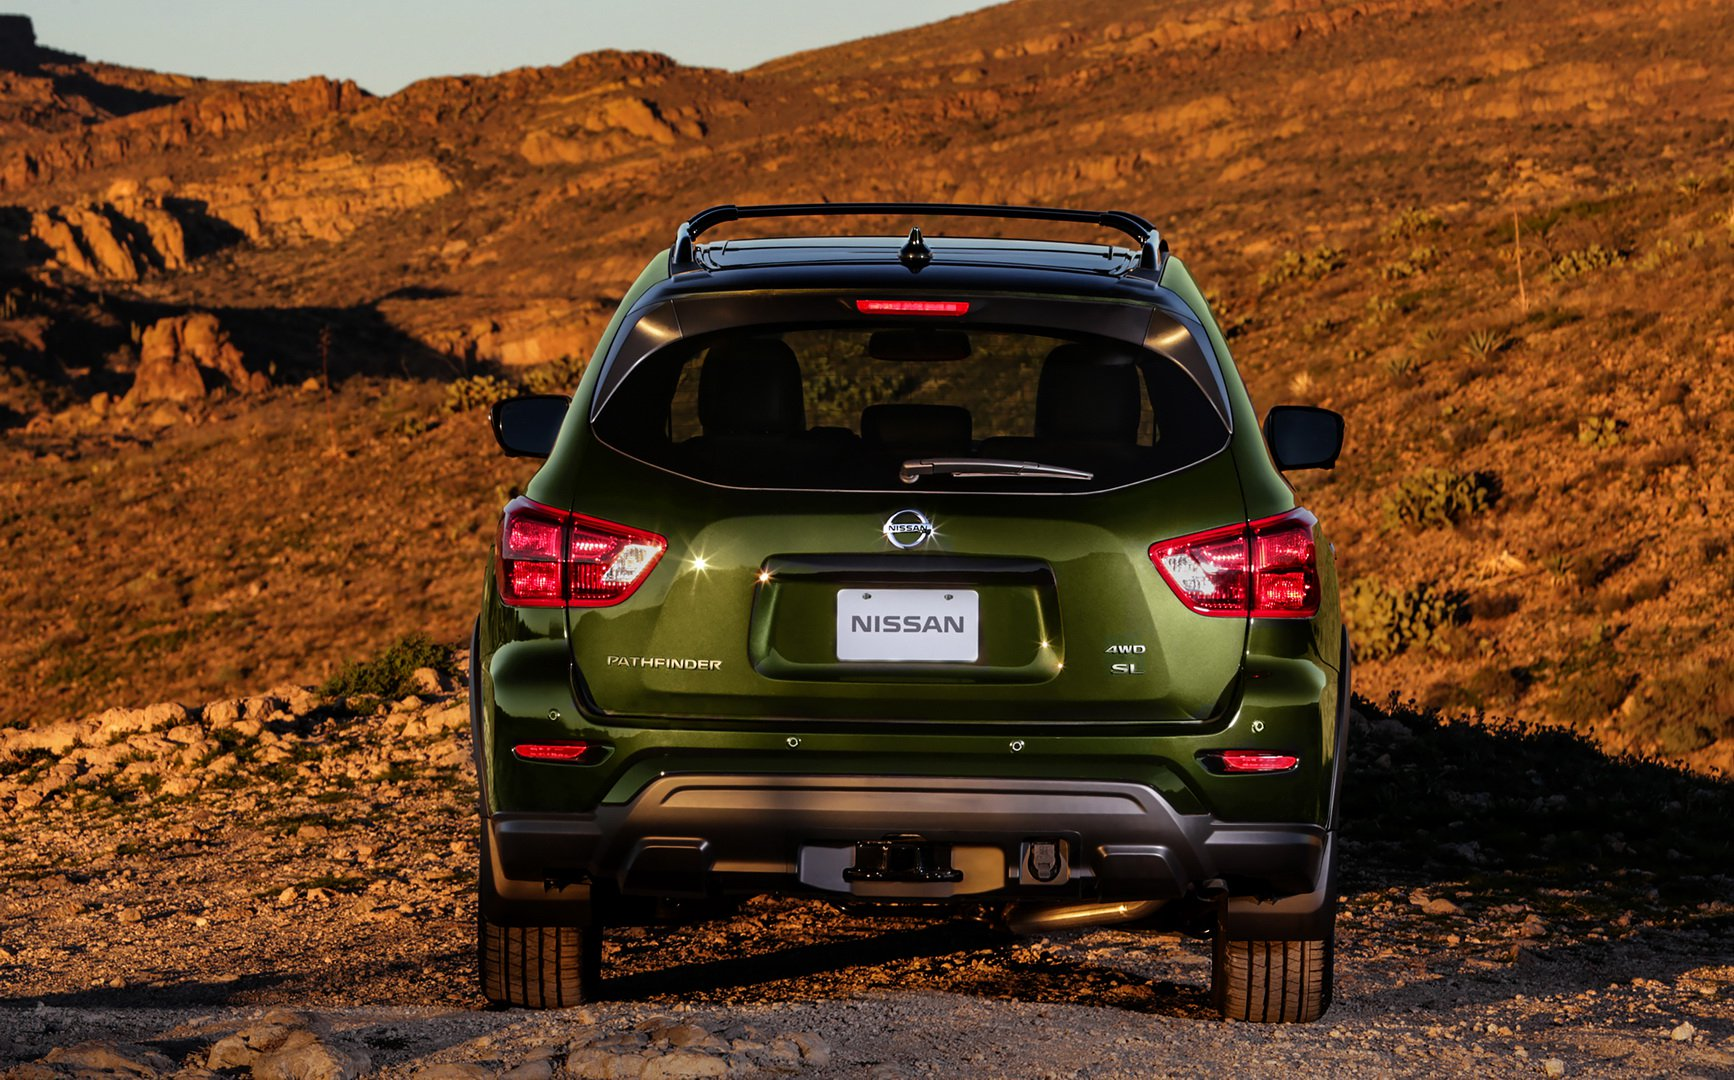 Nissan Pathfinder Rock Creek Edition 2019 (6)